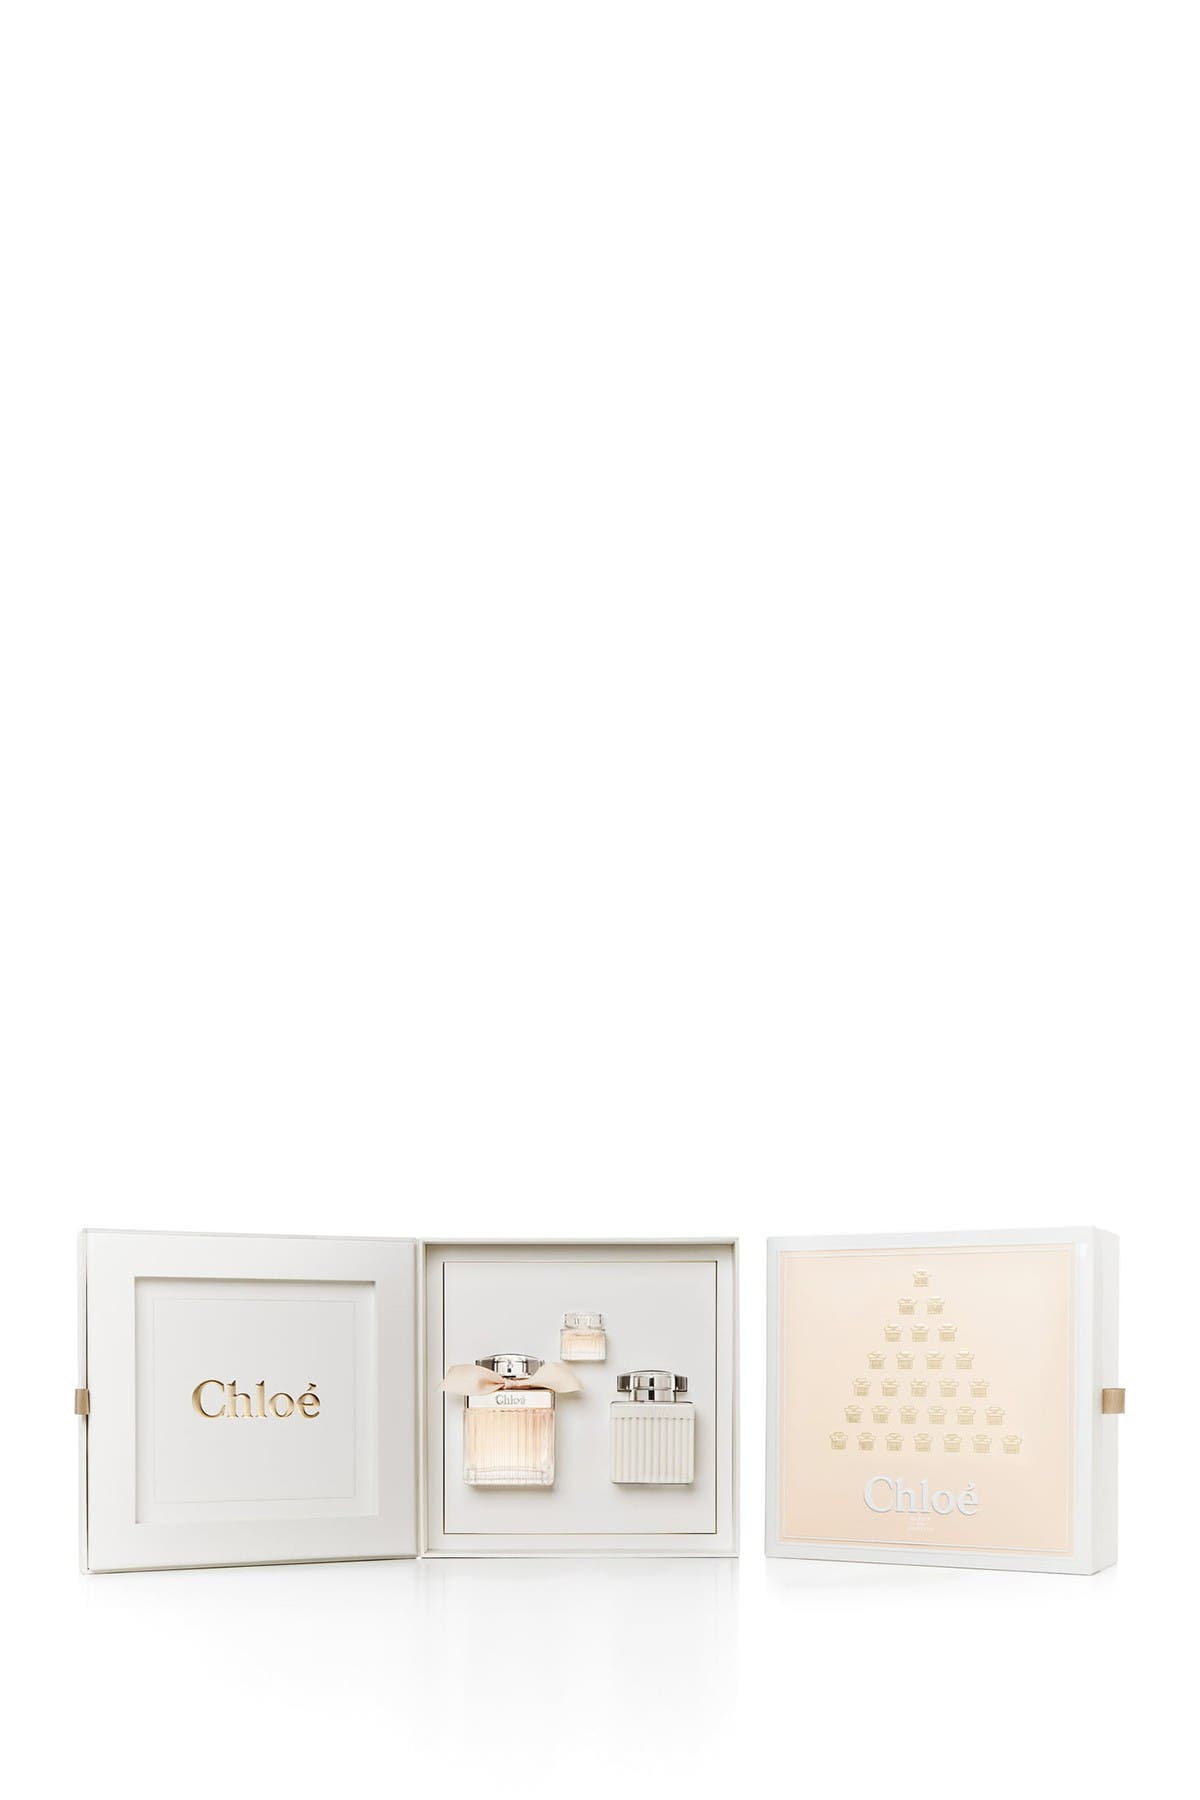 Image of Chloe Fleur de Parfum Fragrance Gift Set